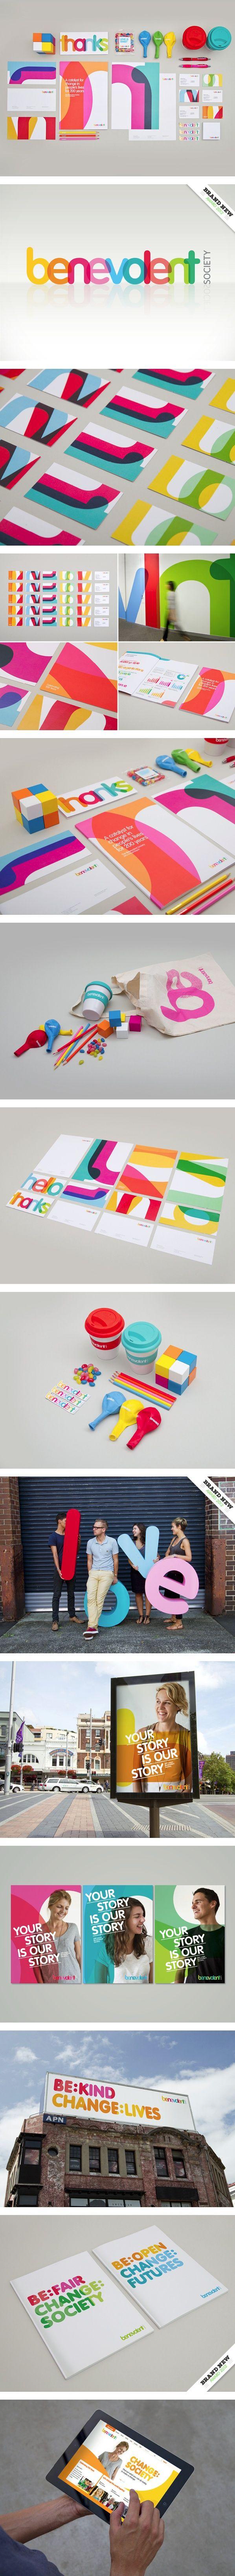 Benevolent Society - designed by Designworks